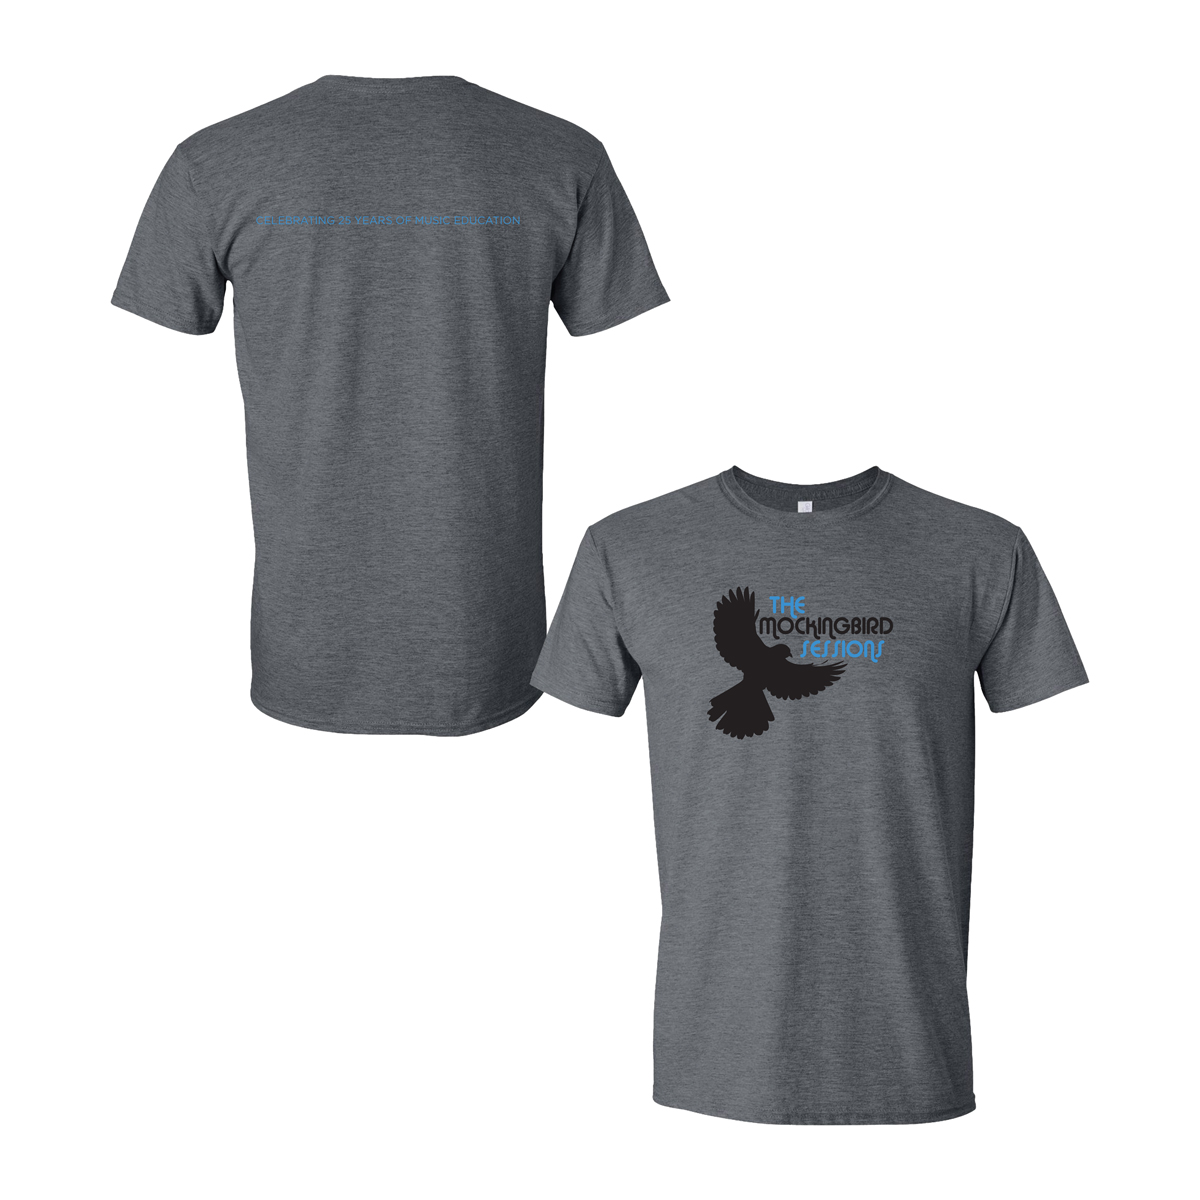 The Mockingbird Sessions Unisex T-shirt